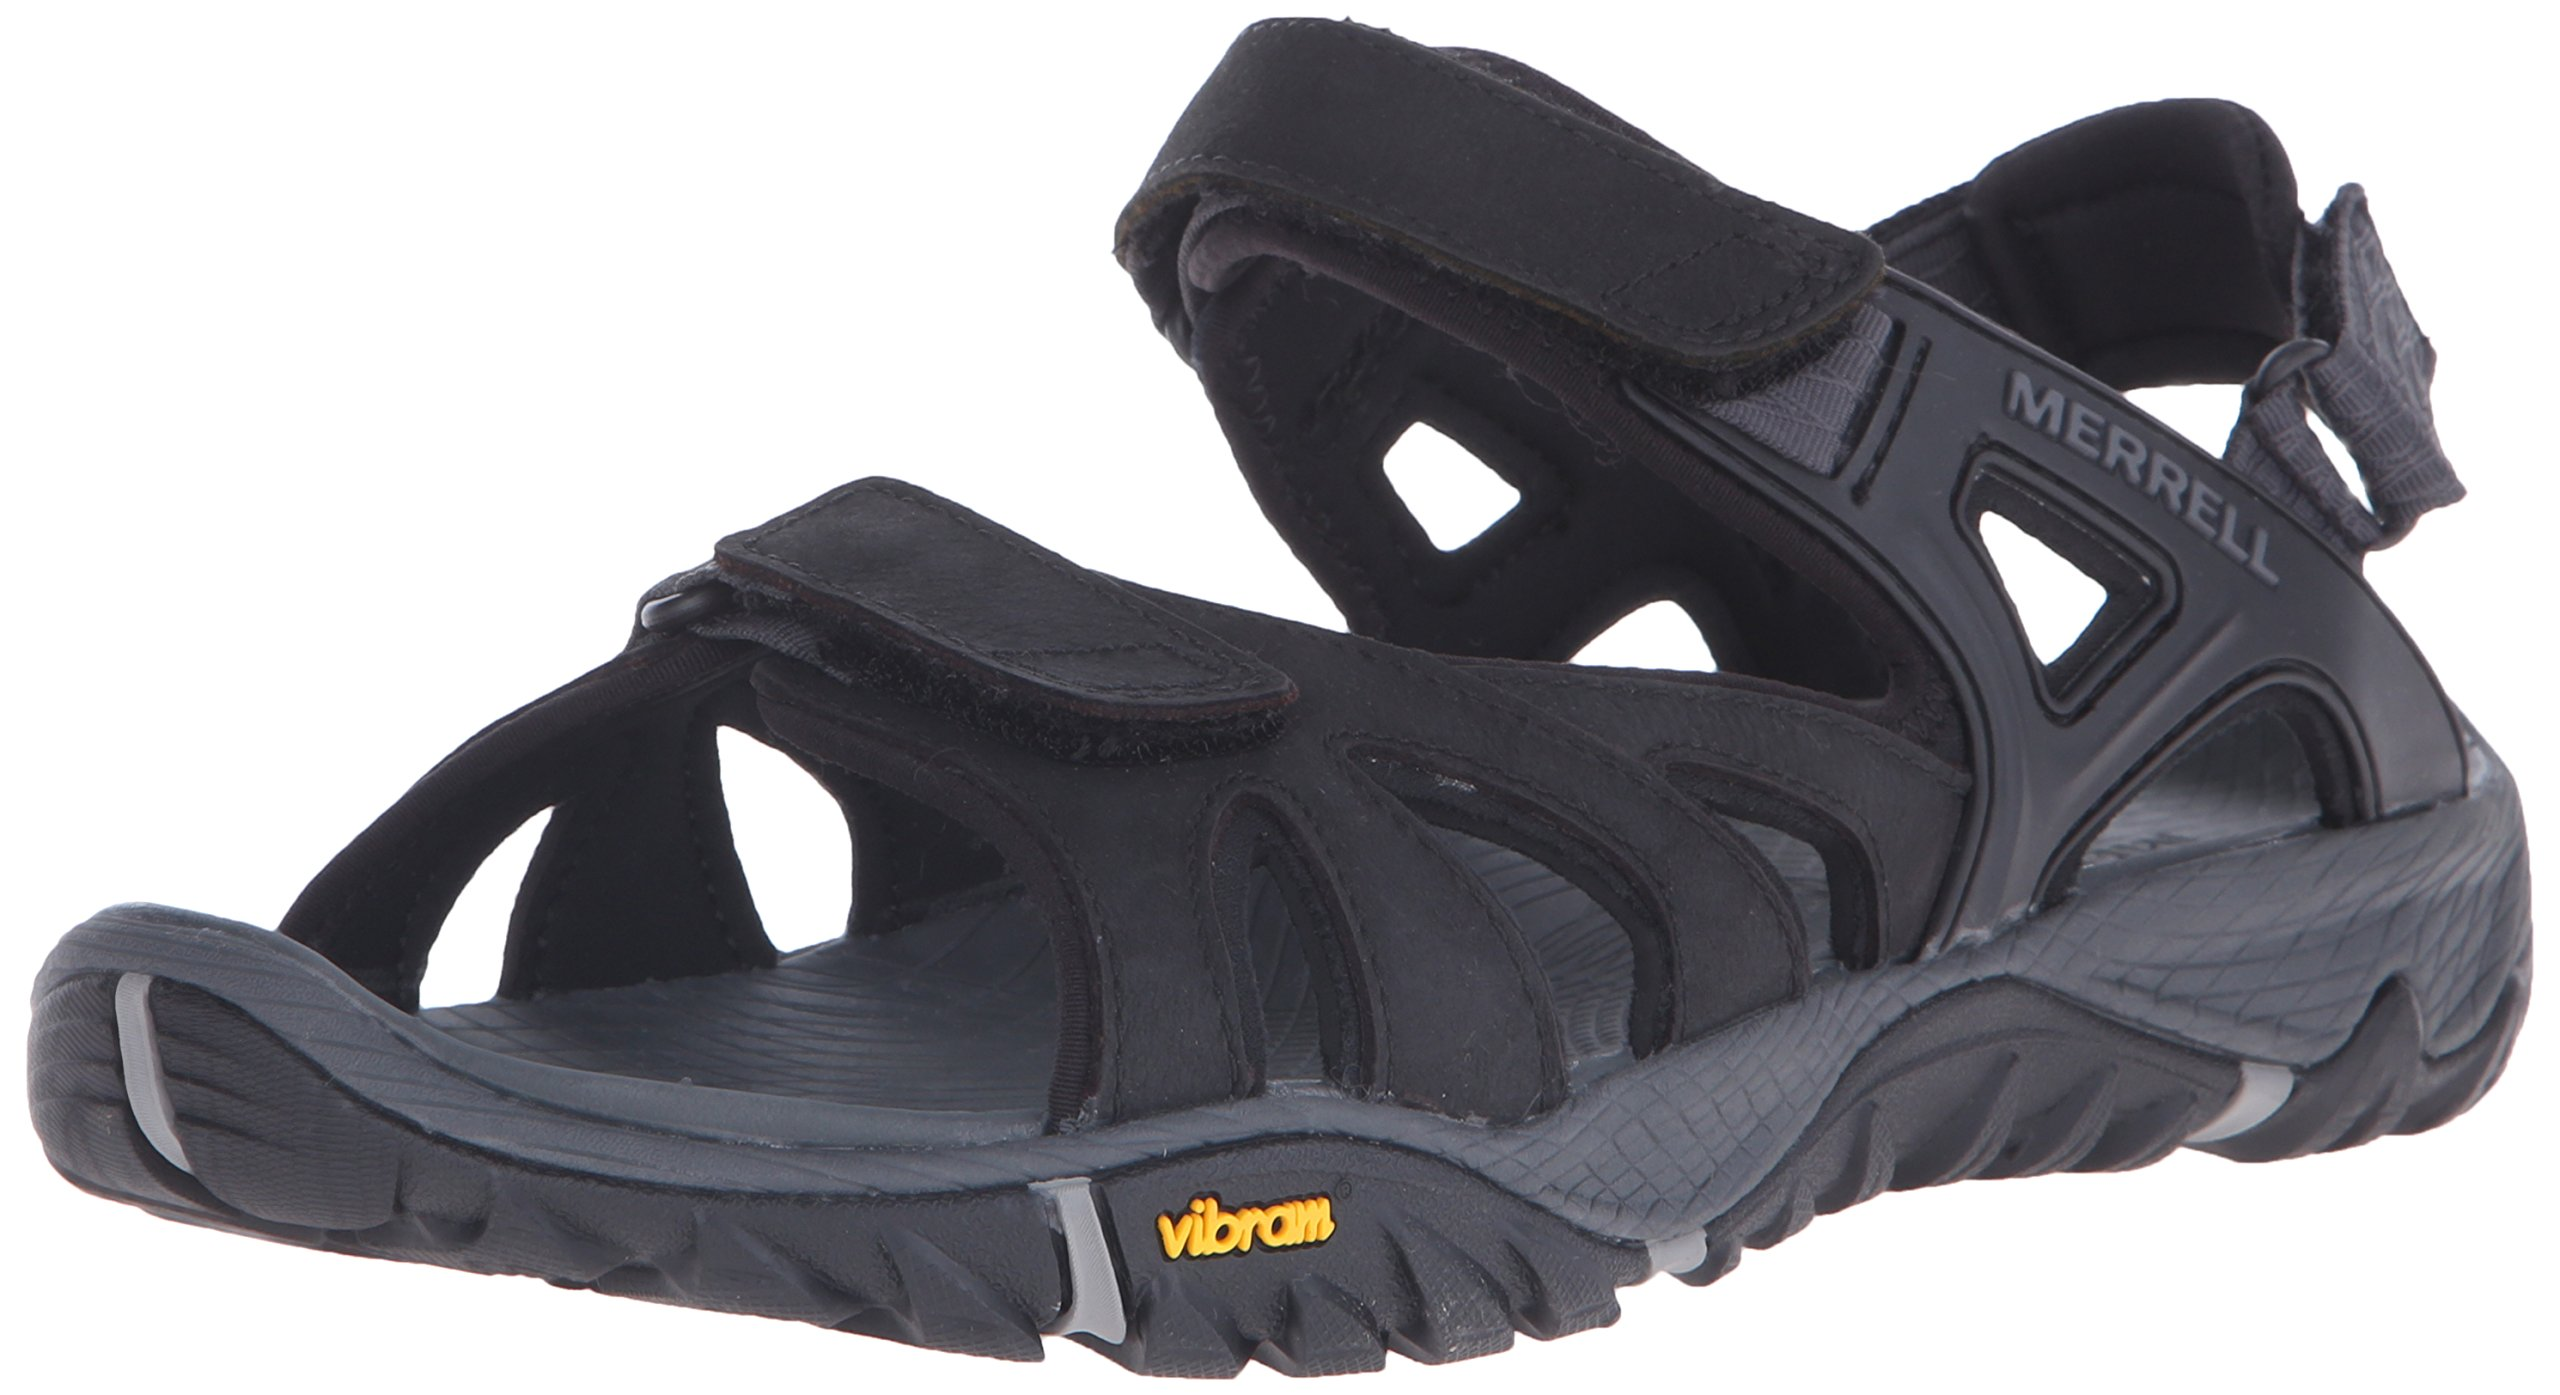 Merrell Men's All Out Blaze Sieve Convertible Water Sandal, Black, 10 M US